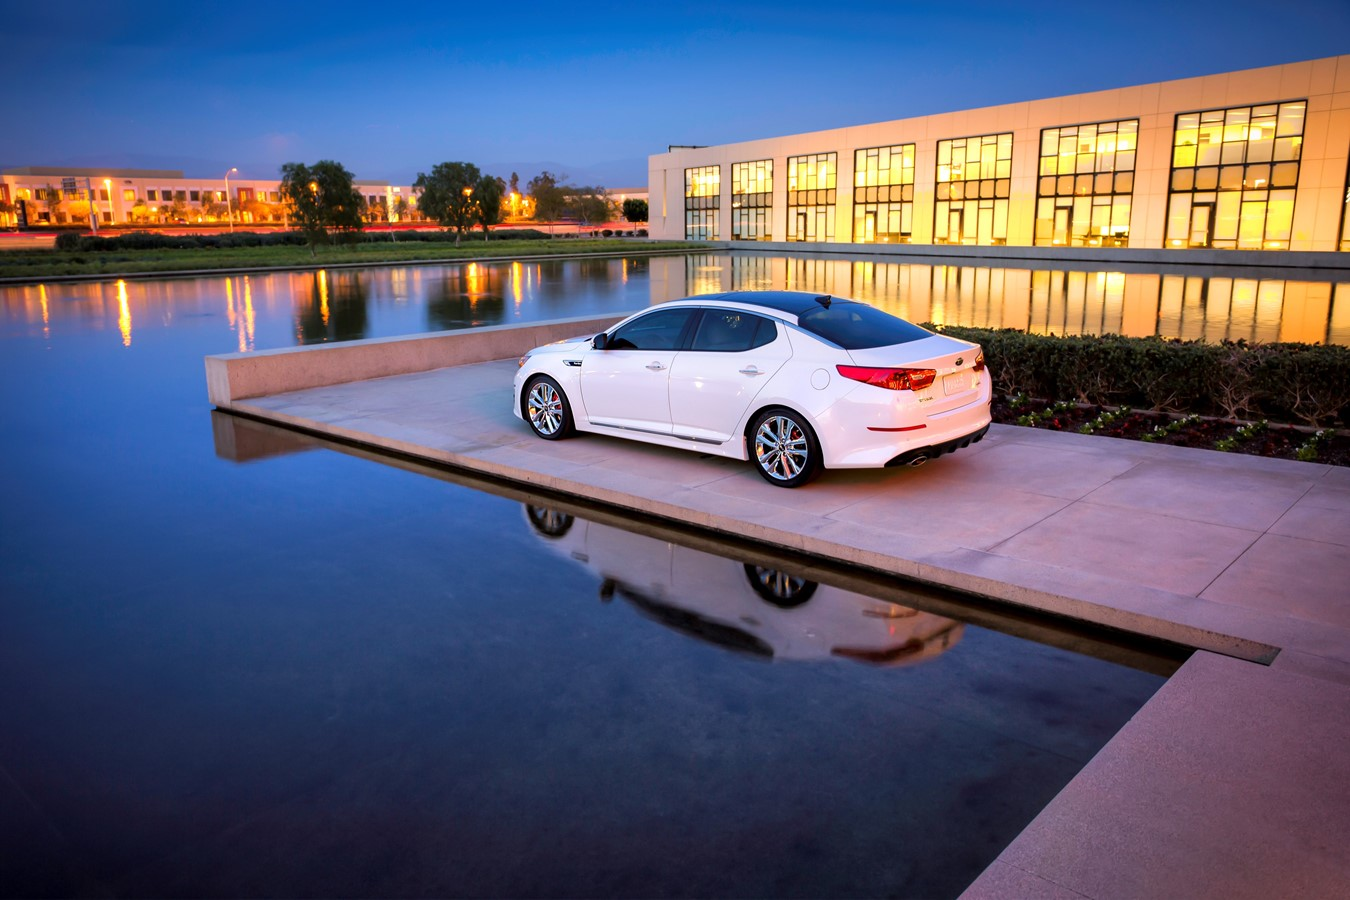 2015 Kia Optima for sale near South Bend, Indiana